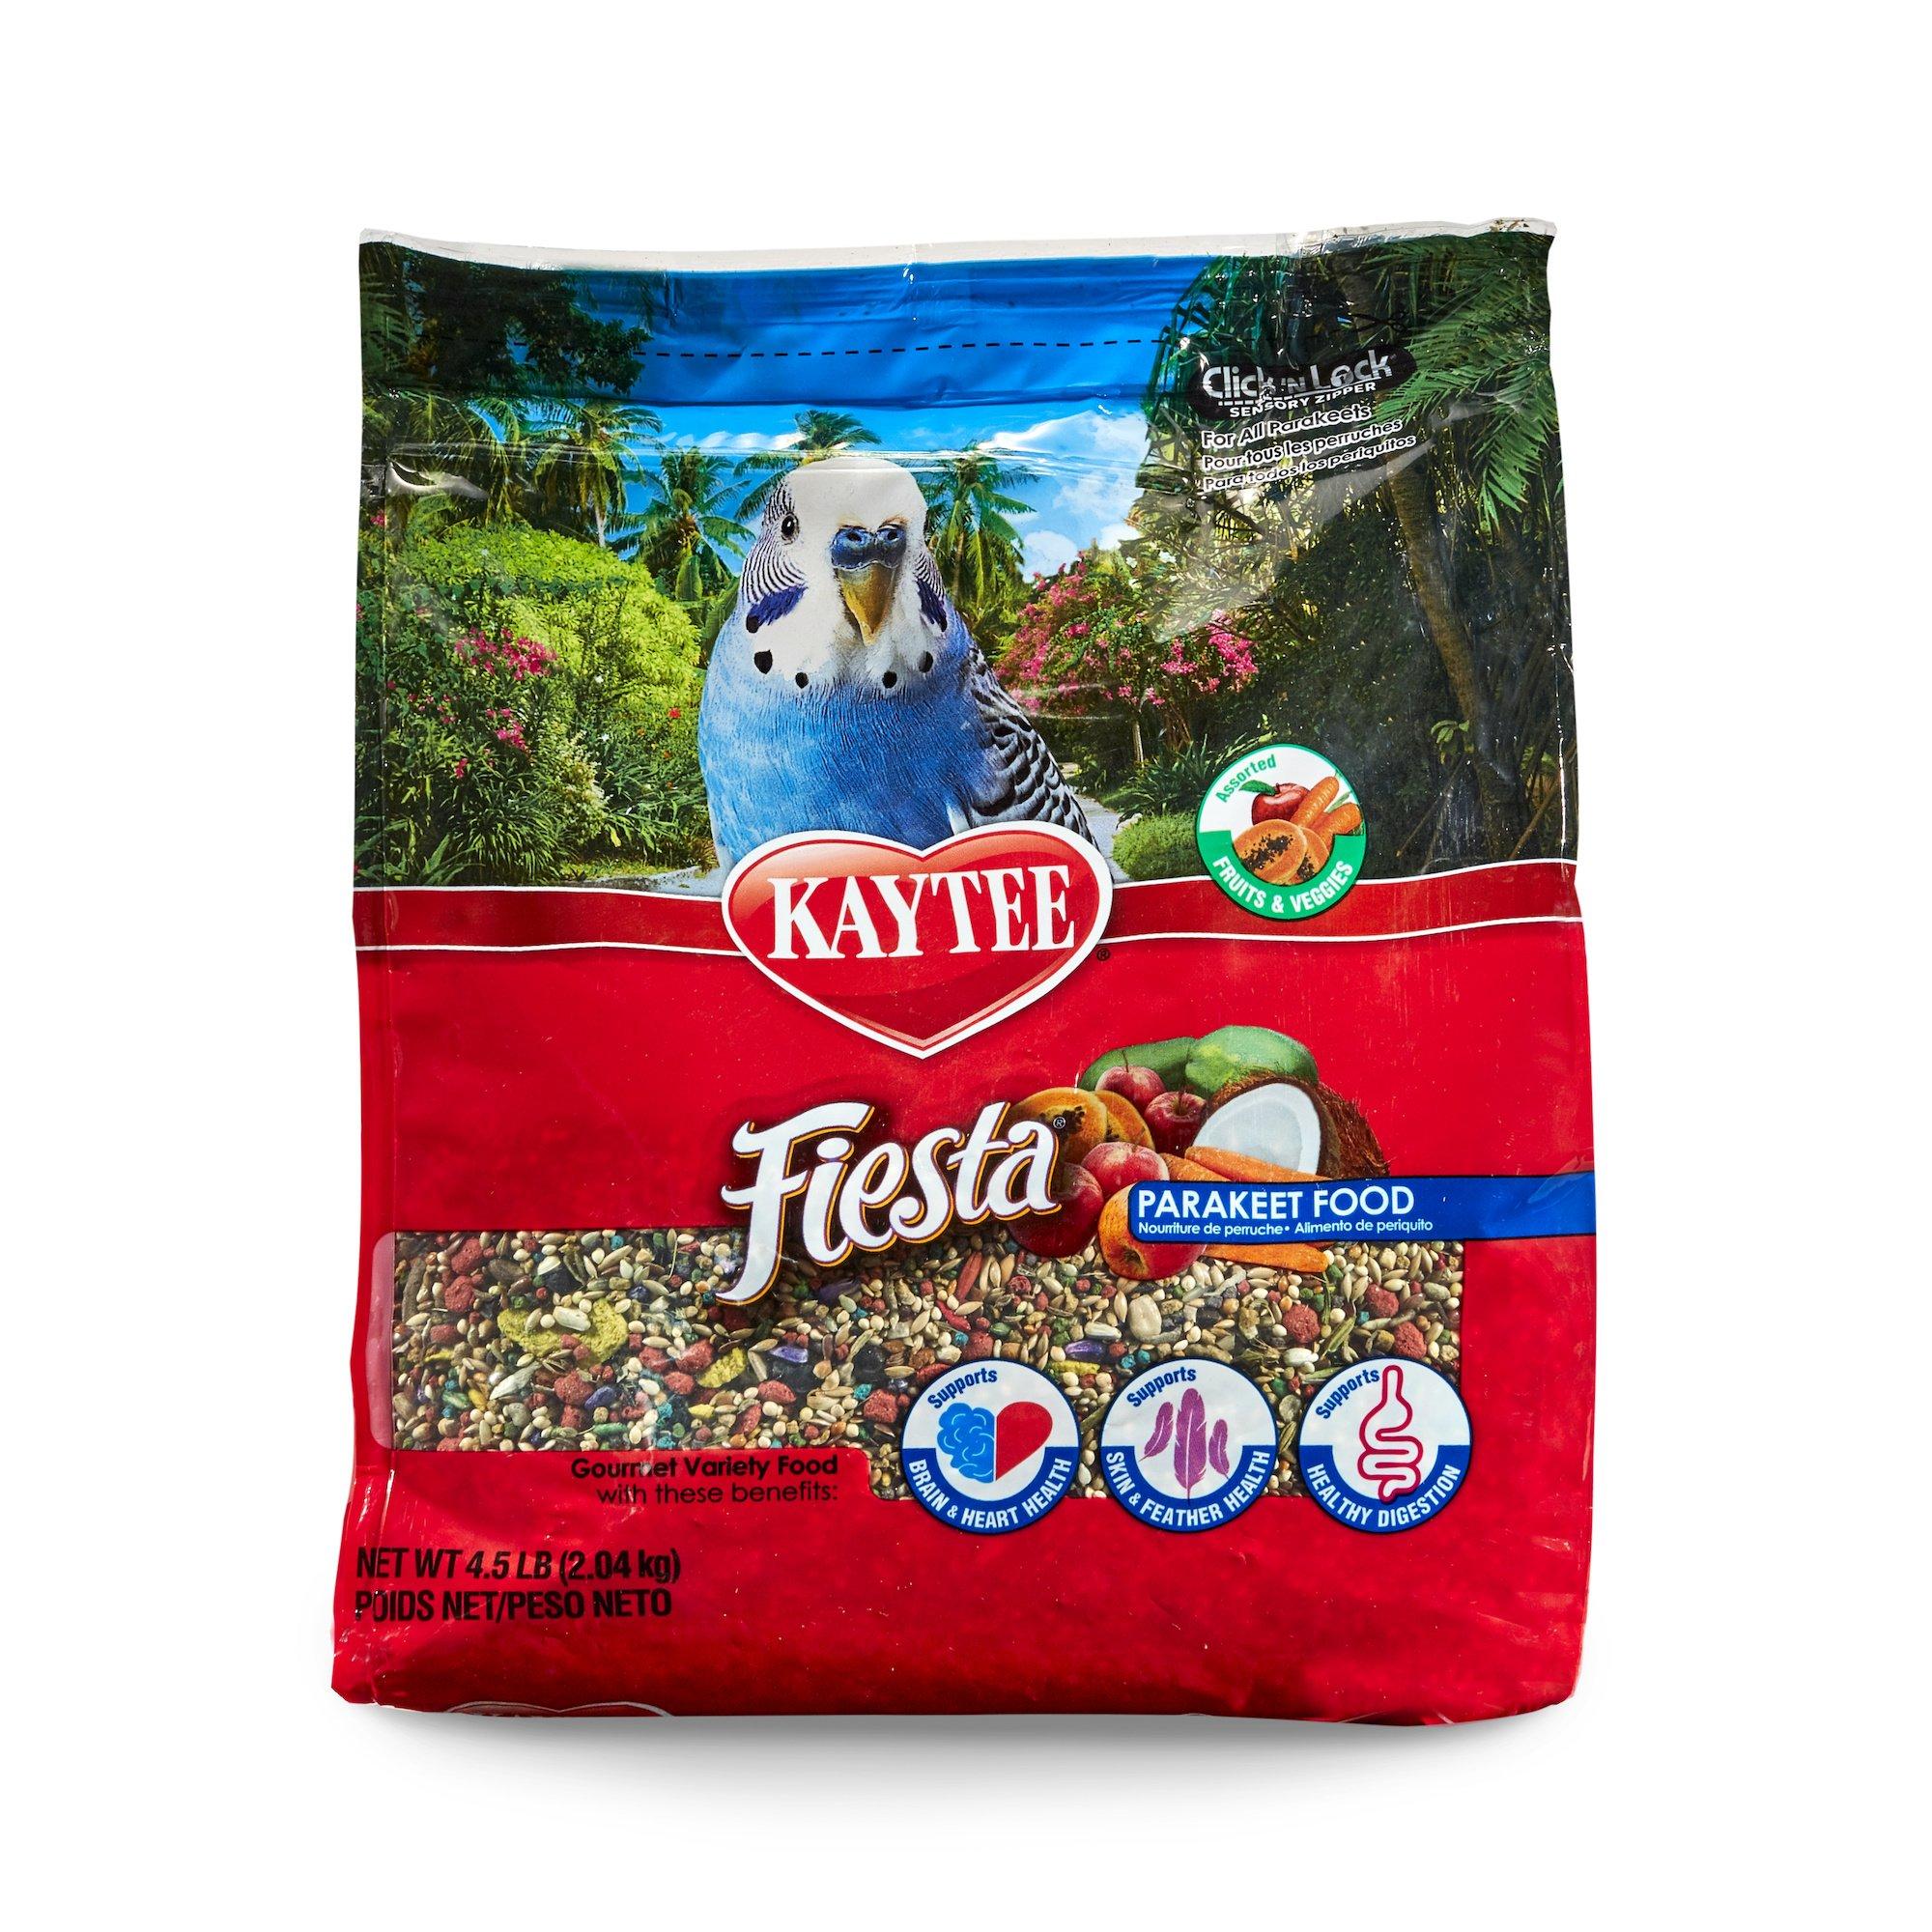 Kaytee Fiesta Parakeet Food, 4.5 pounds